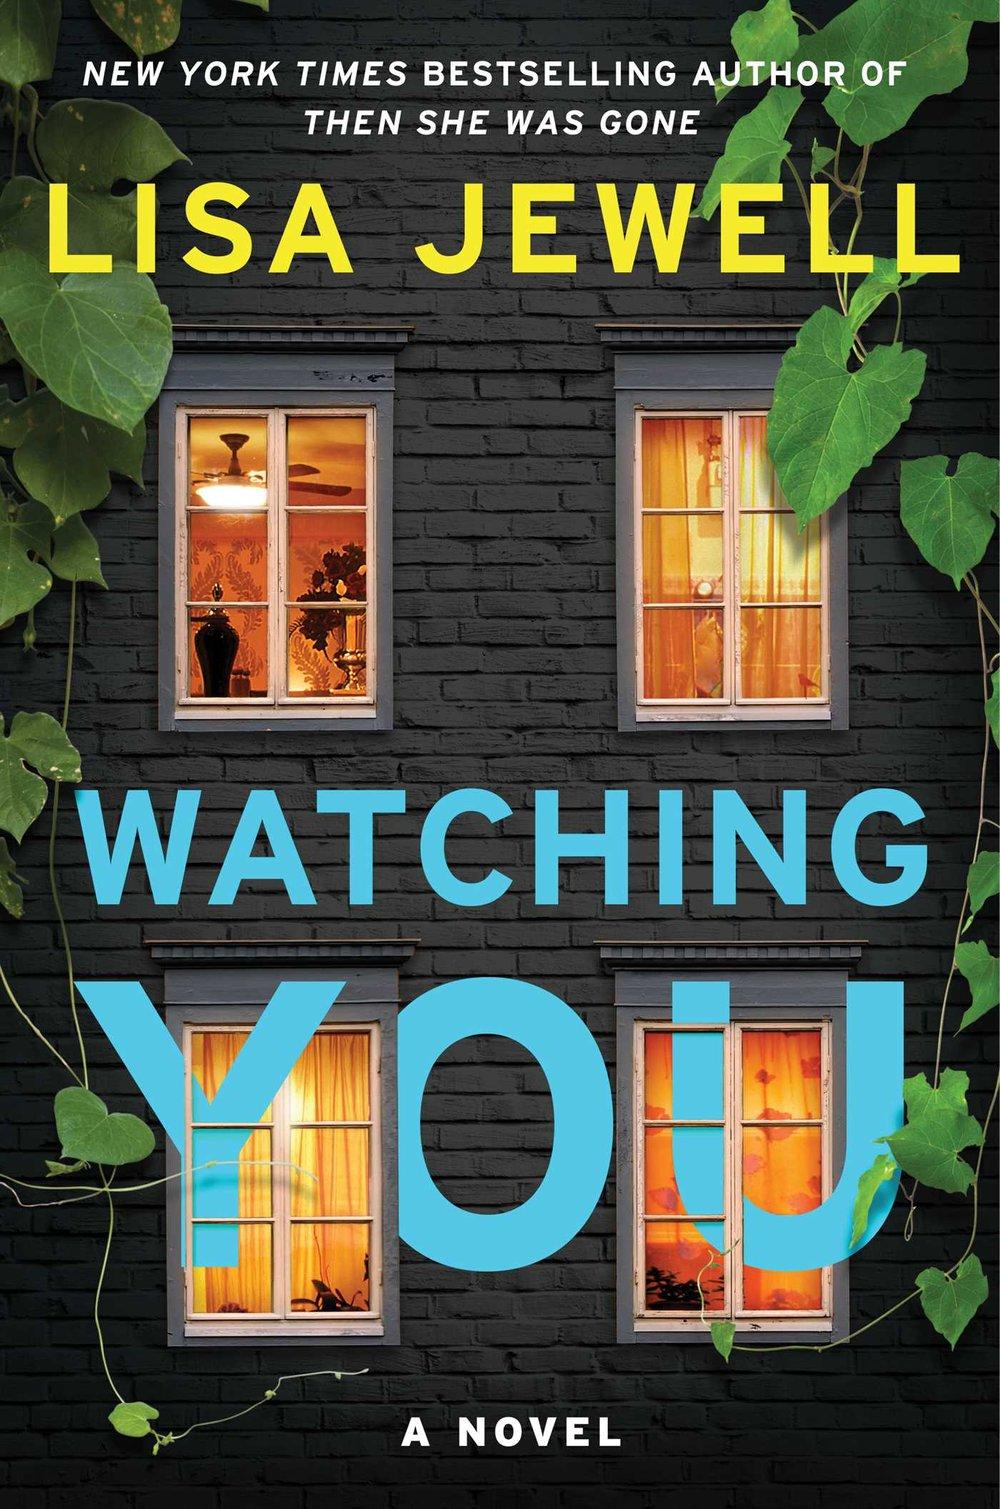 watching-you-9781501190070_hr.jpg